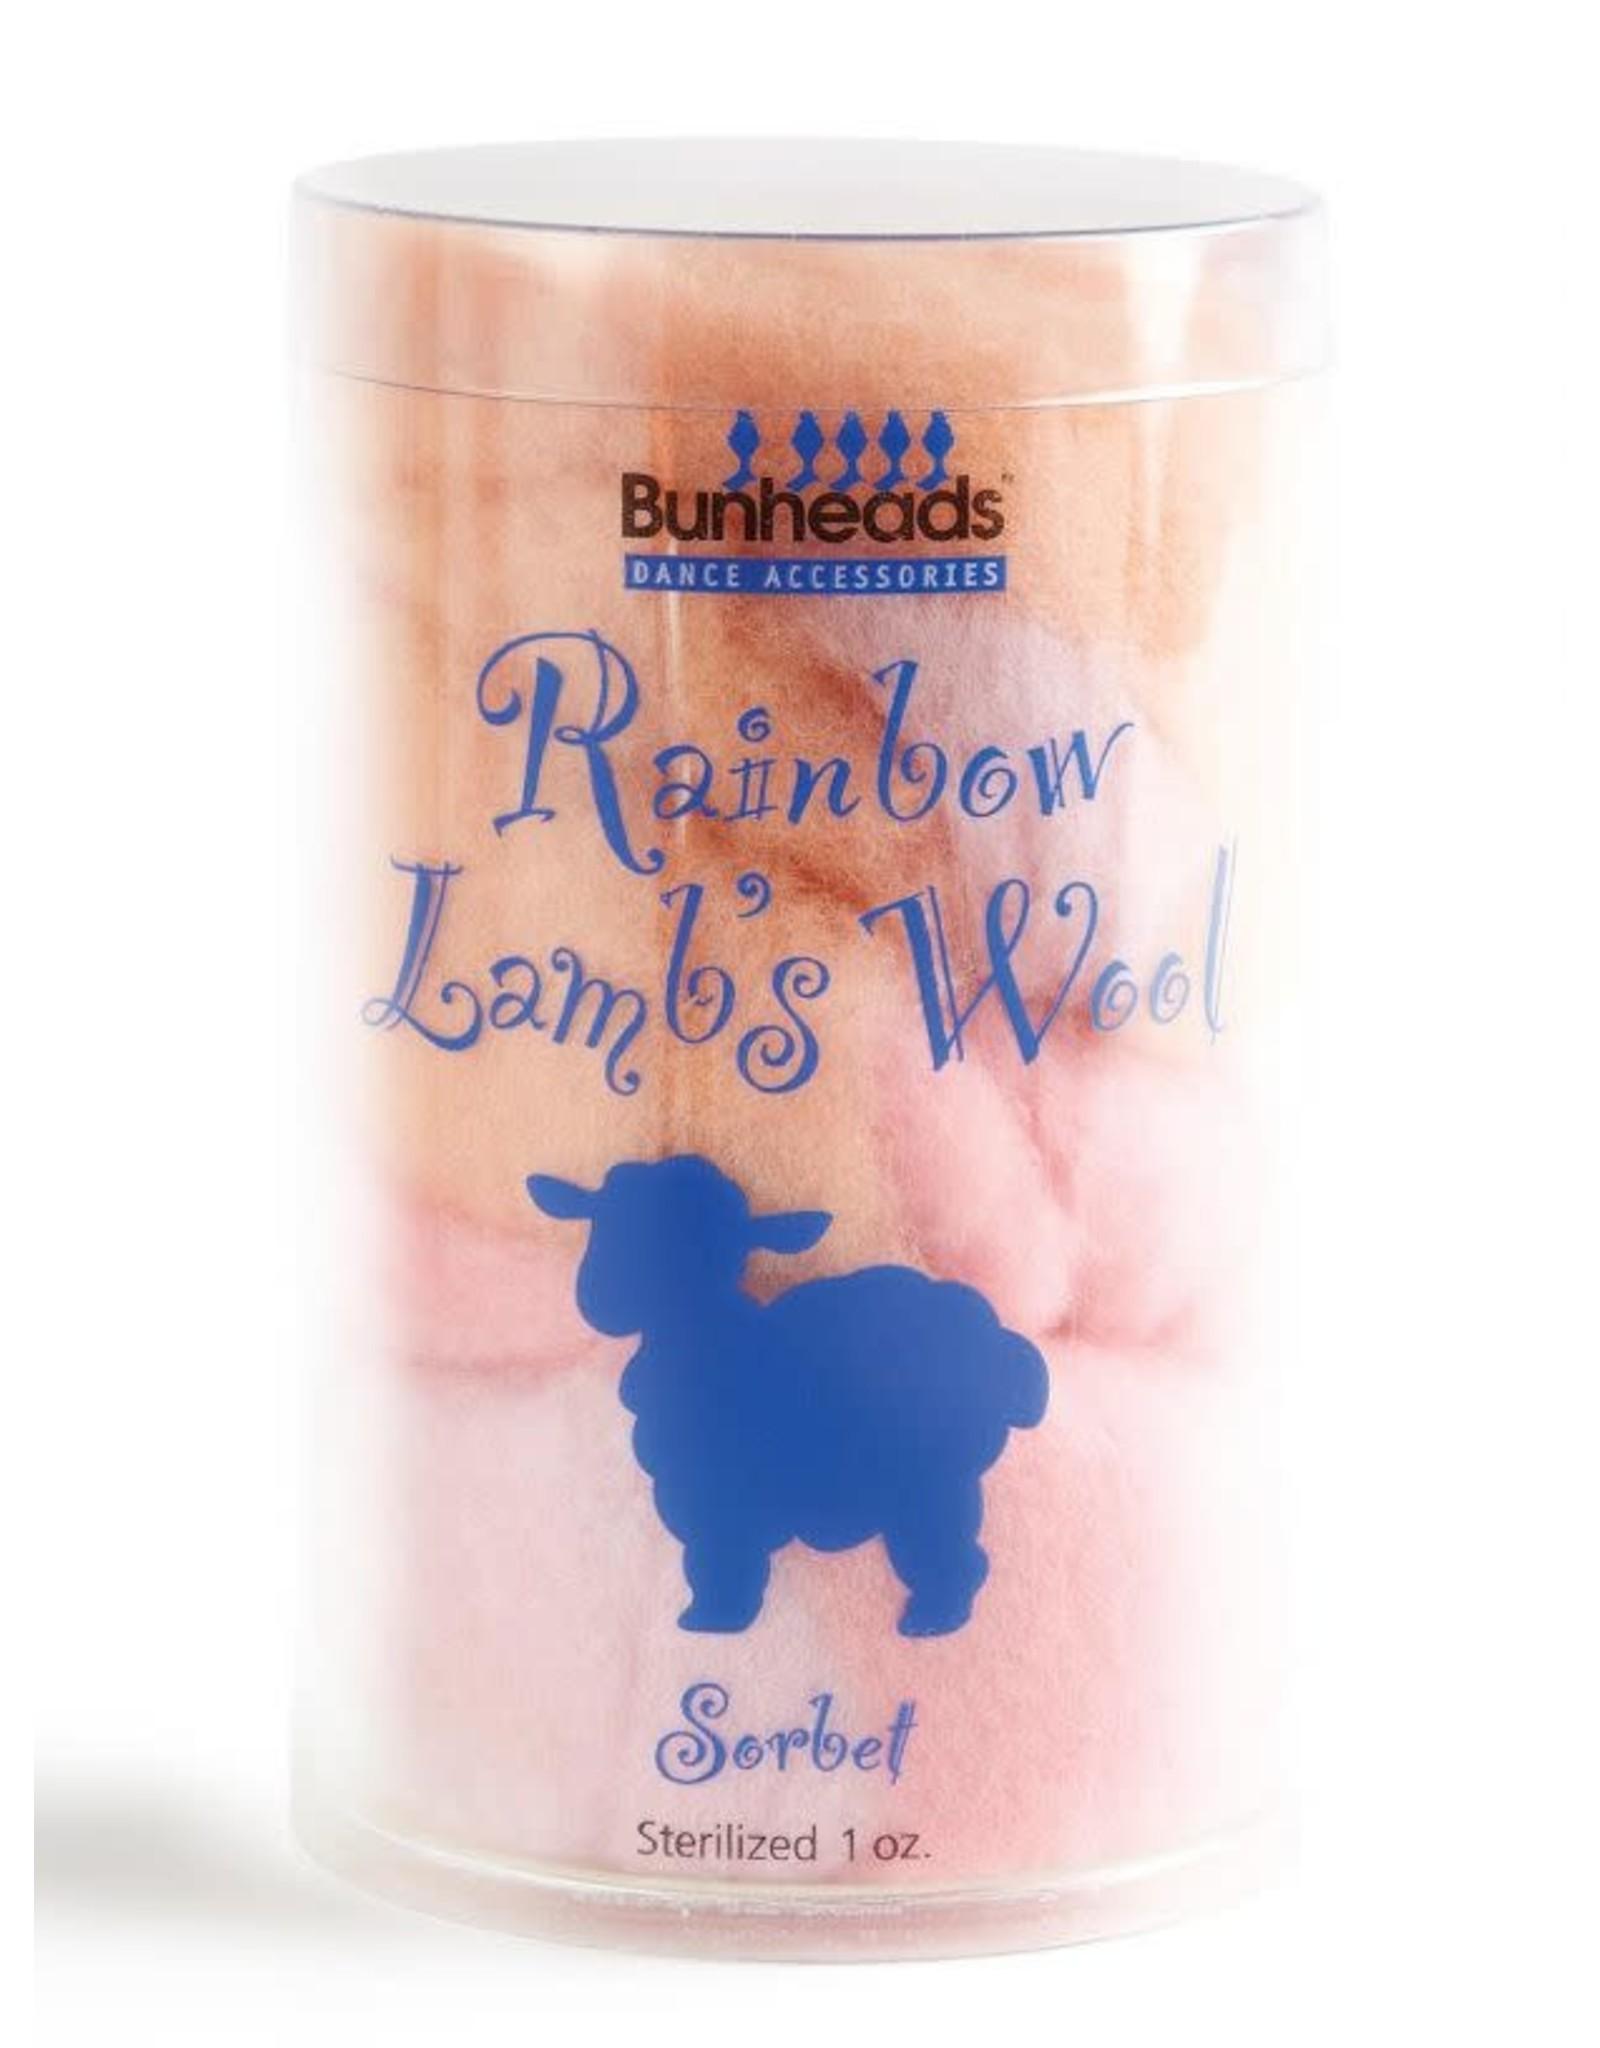 Bunheads Lamb's Wool